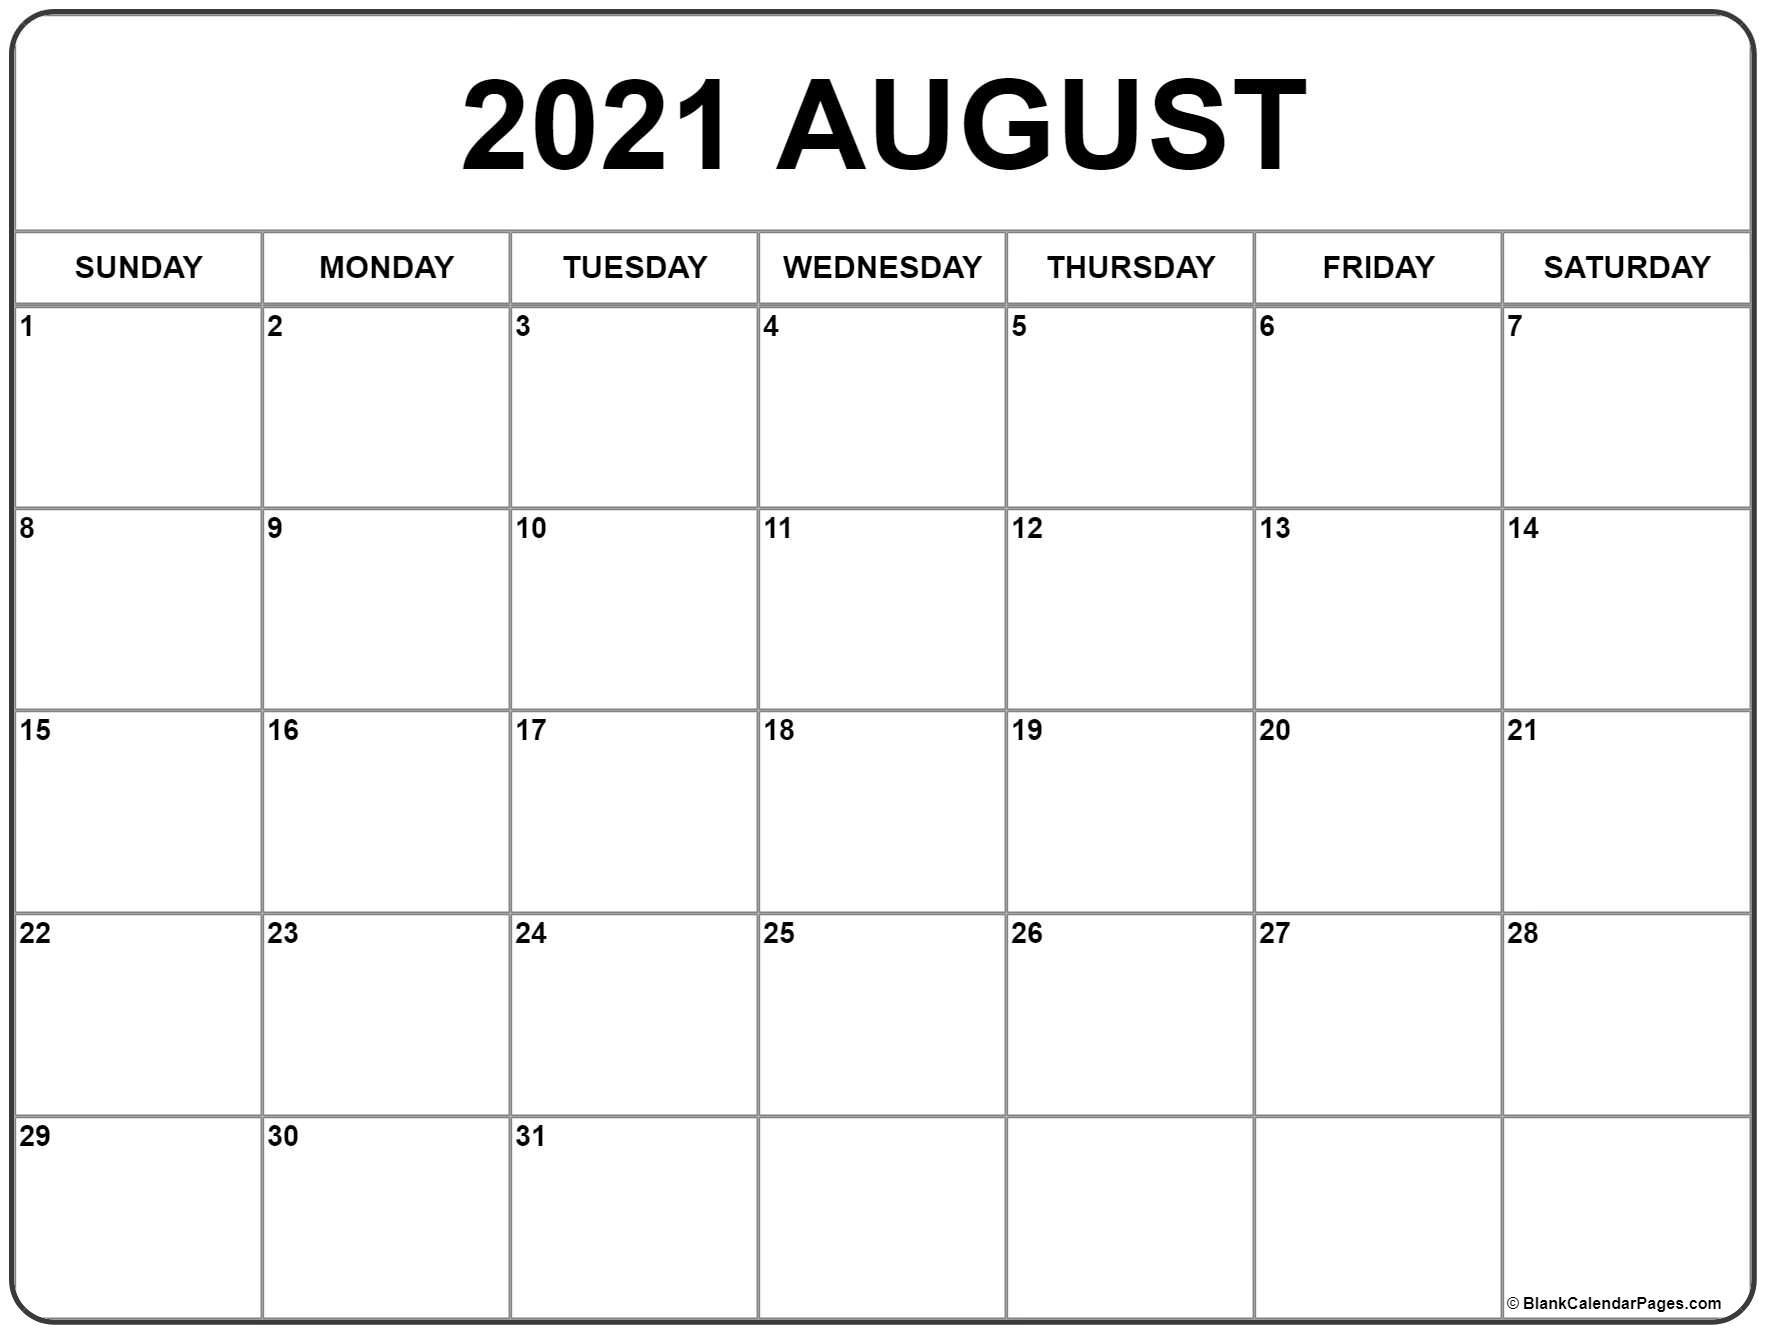 Take Calendar August 2021 Through December 2021